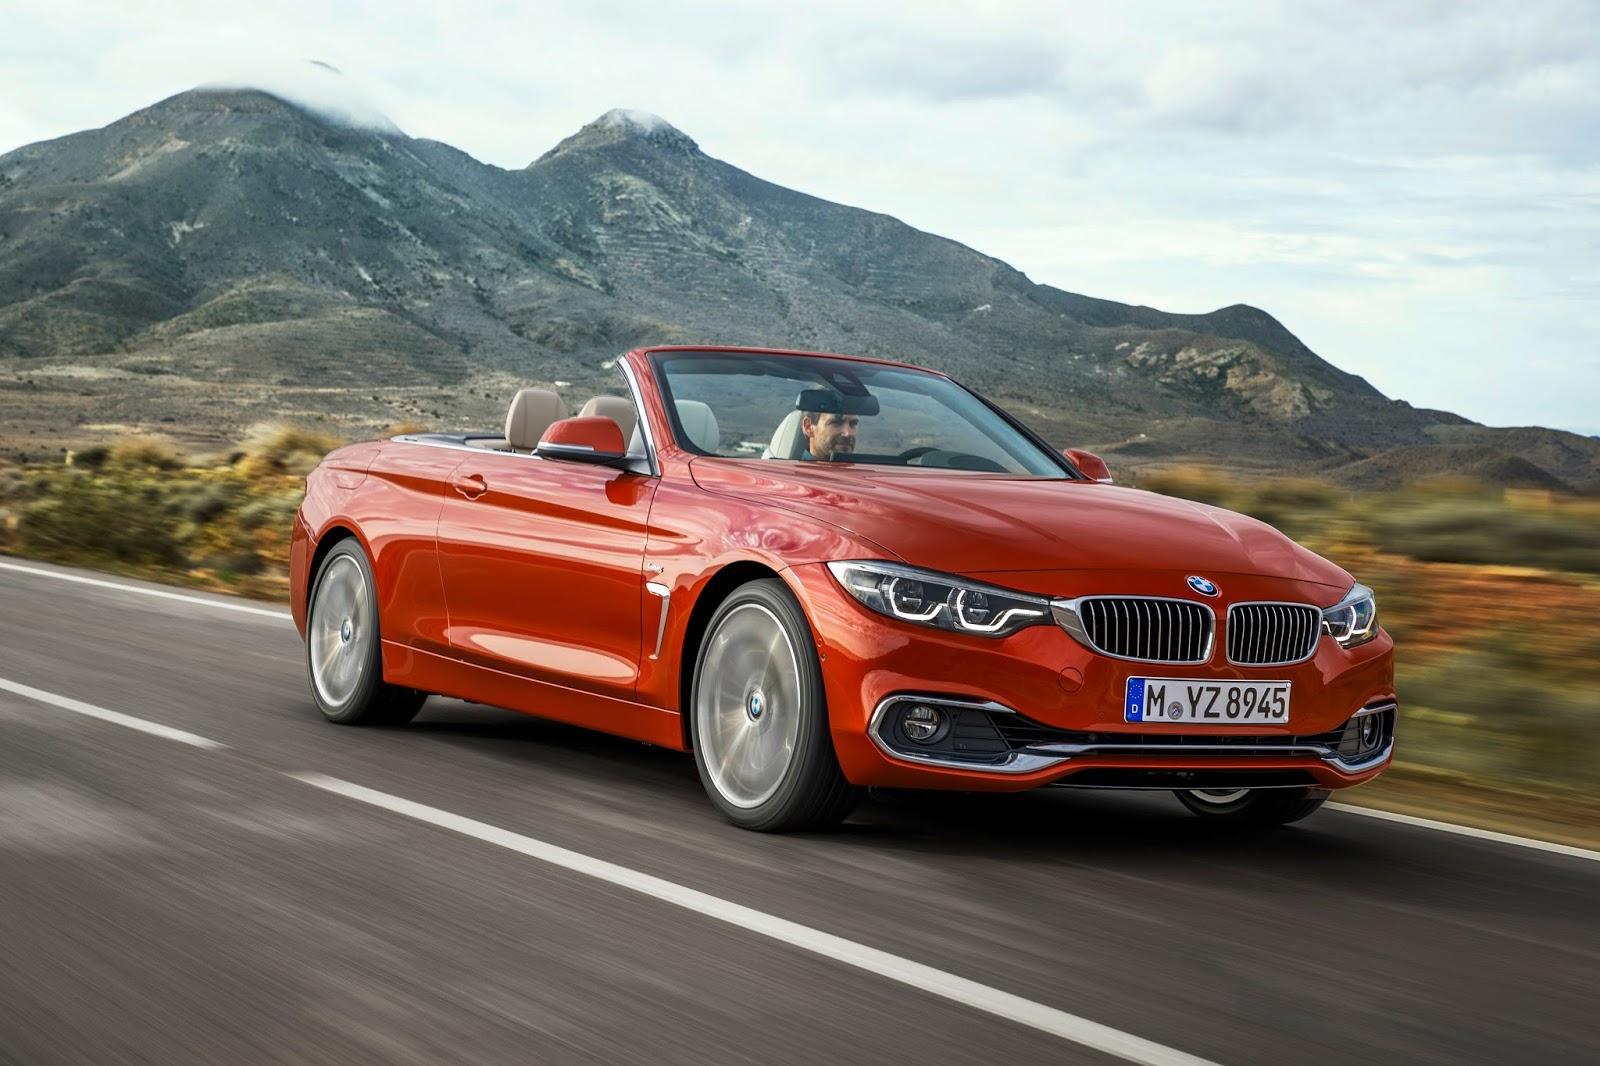 P90245274 highRes bmw 4 series luxury Η νέα BMW Σειρά 4, με πιο σφιχτή ρύθμιση ανάρτησης BMW, Bmw 4, BMW 4 Cabrio, BMW 4 Coupe, BMW 4 Gran Coupé, Facelift